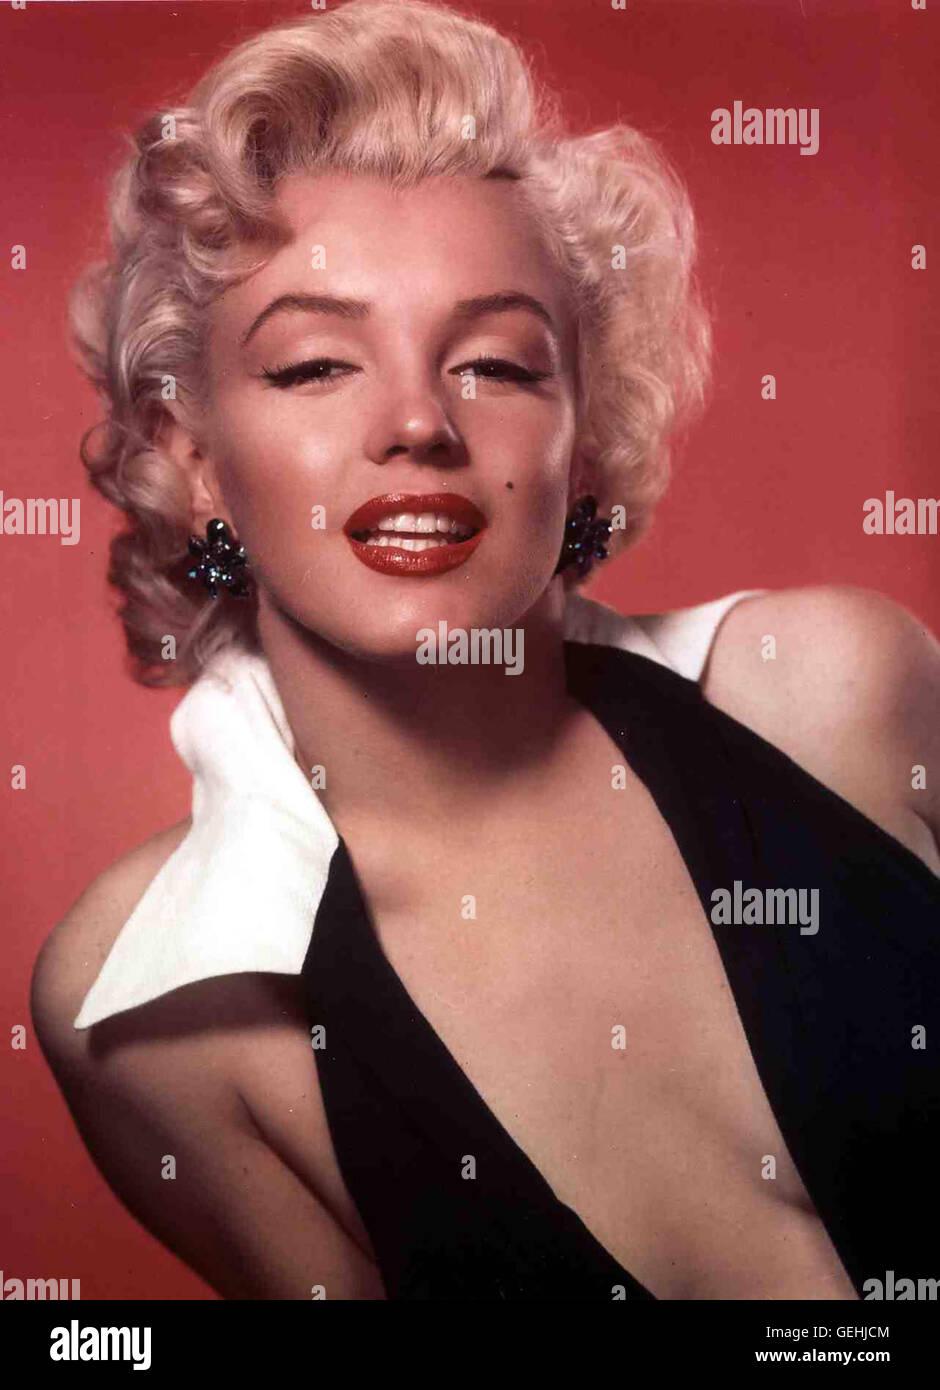 Marily Monroe *** Local Caption *** 0, Monroe, Marilyn, Marilyn Monroe - Jenseits Der Legende - Stock Image